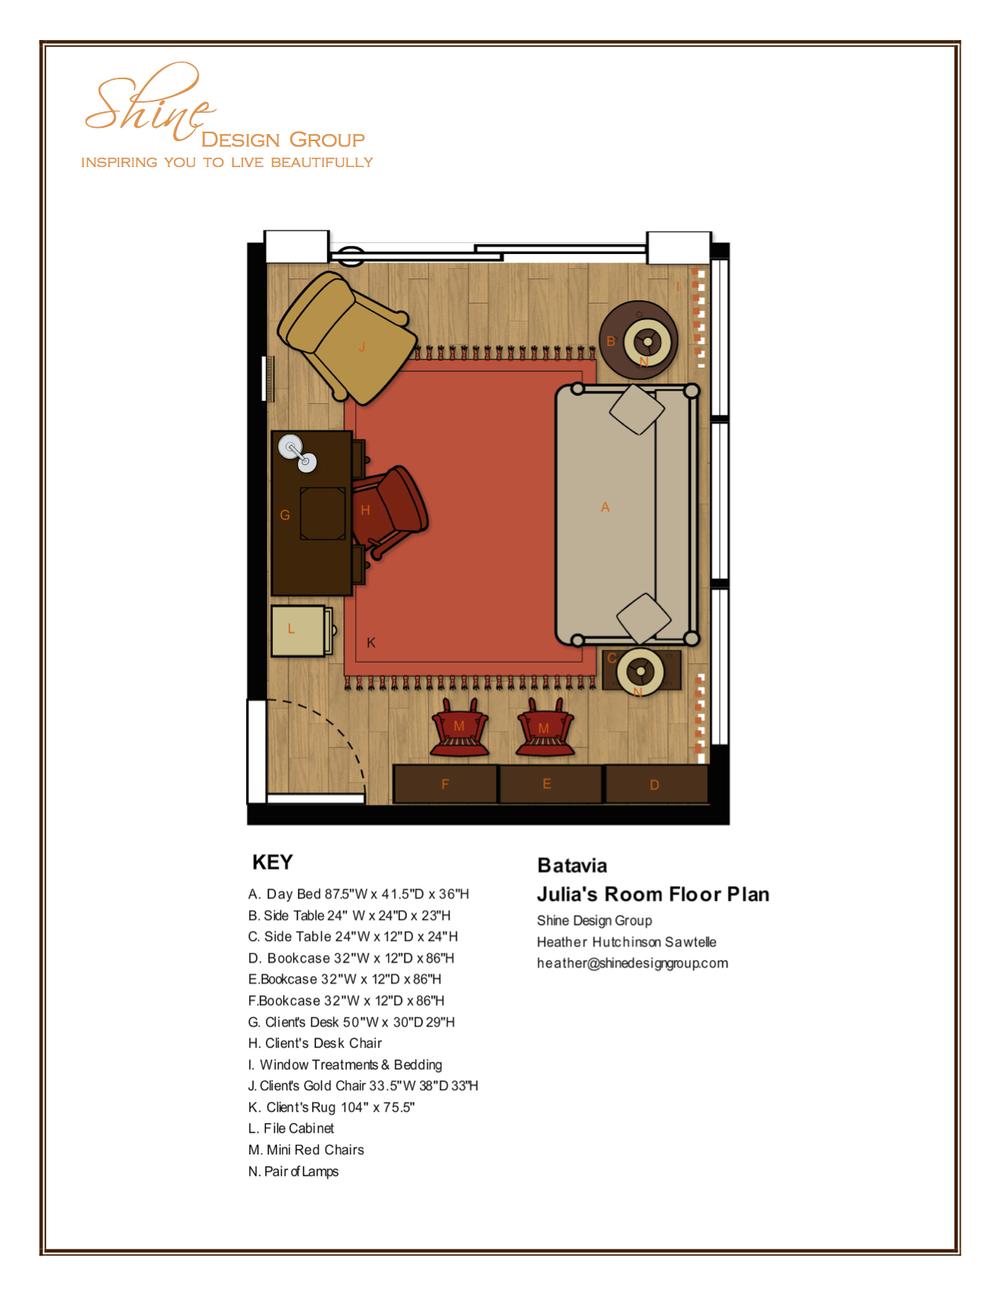 SDG Batavia Julias RM Floor Plan.jpg